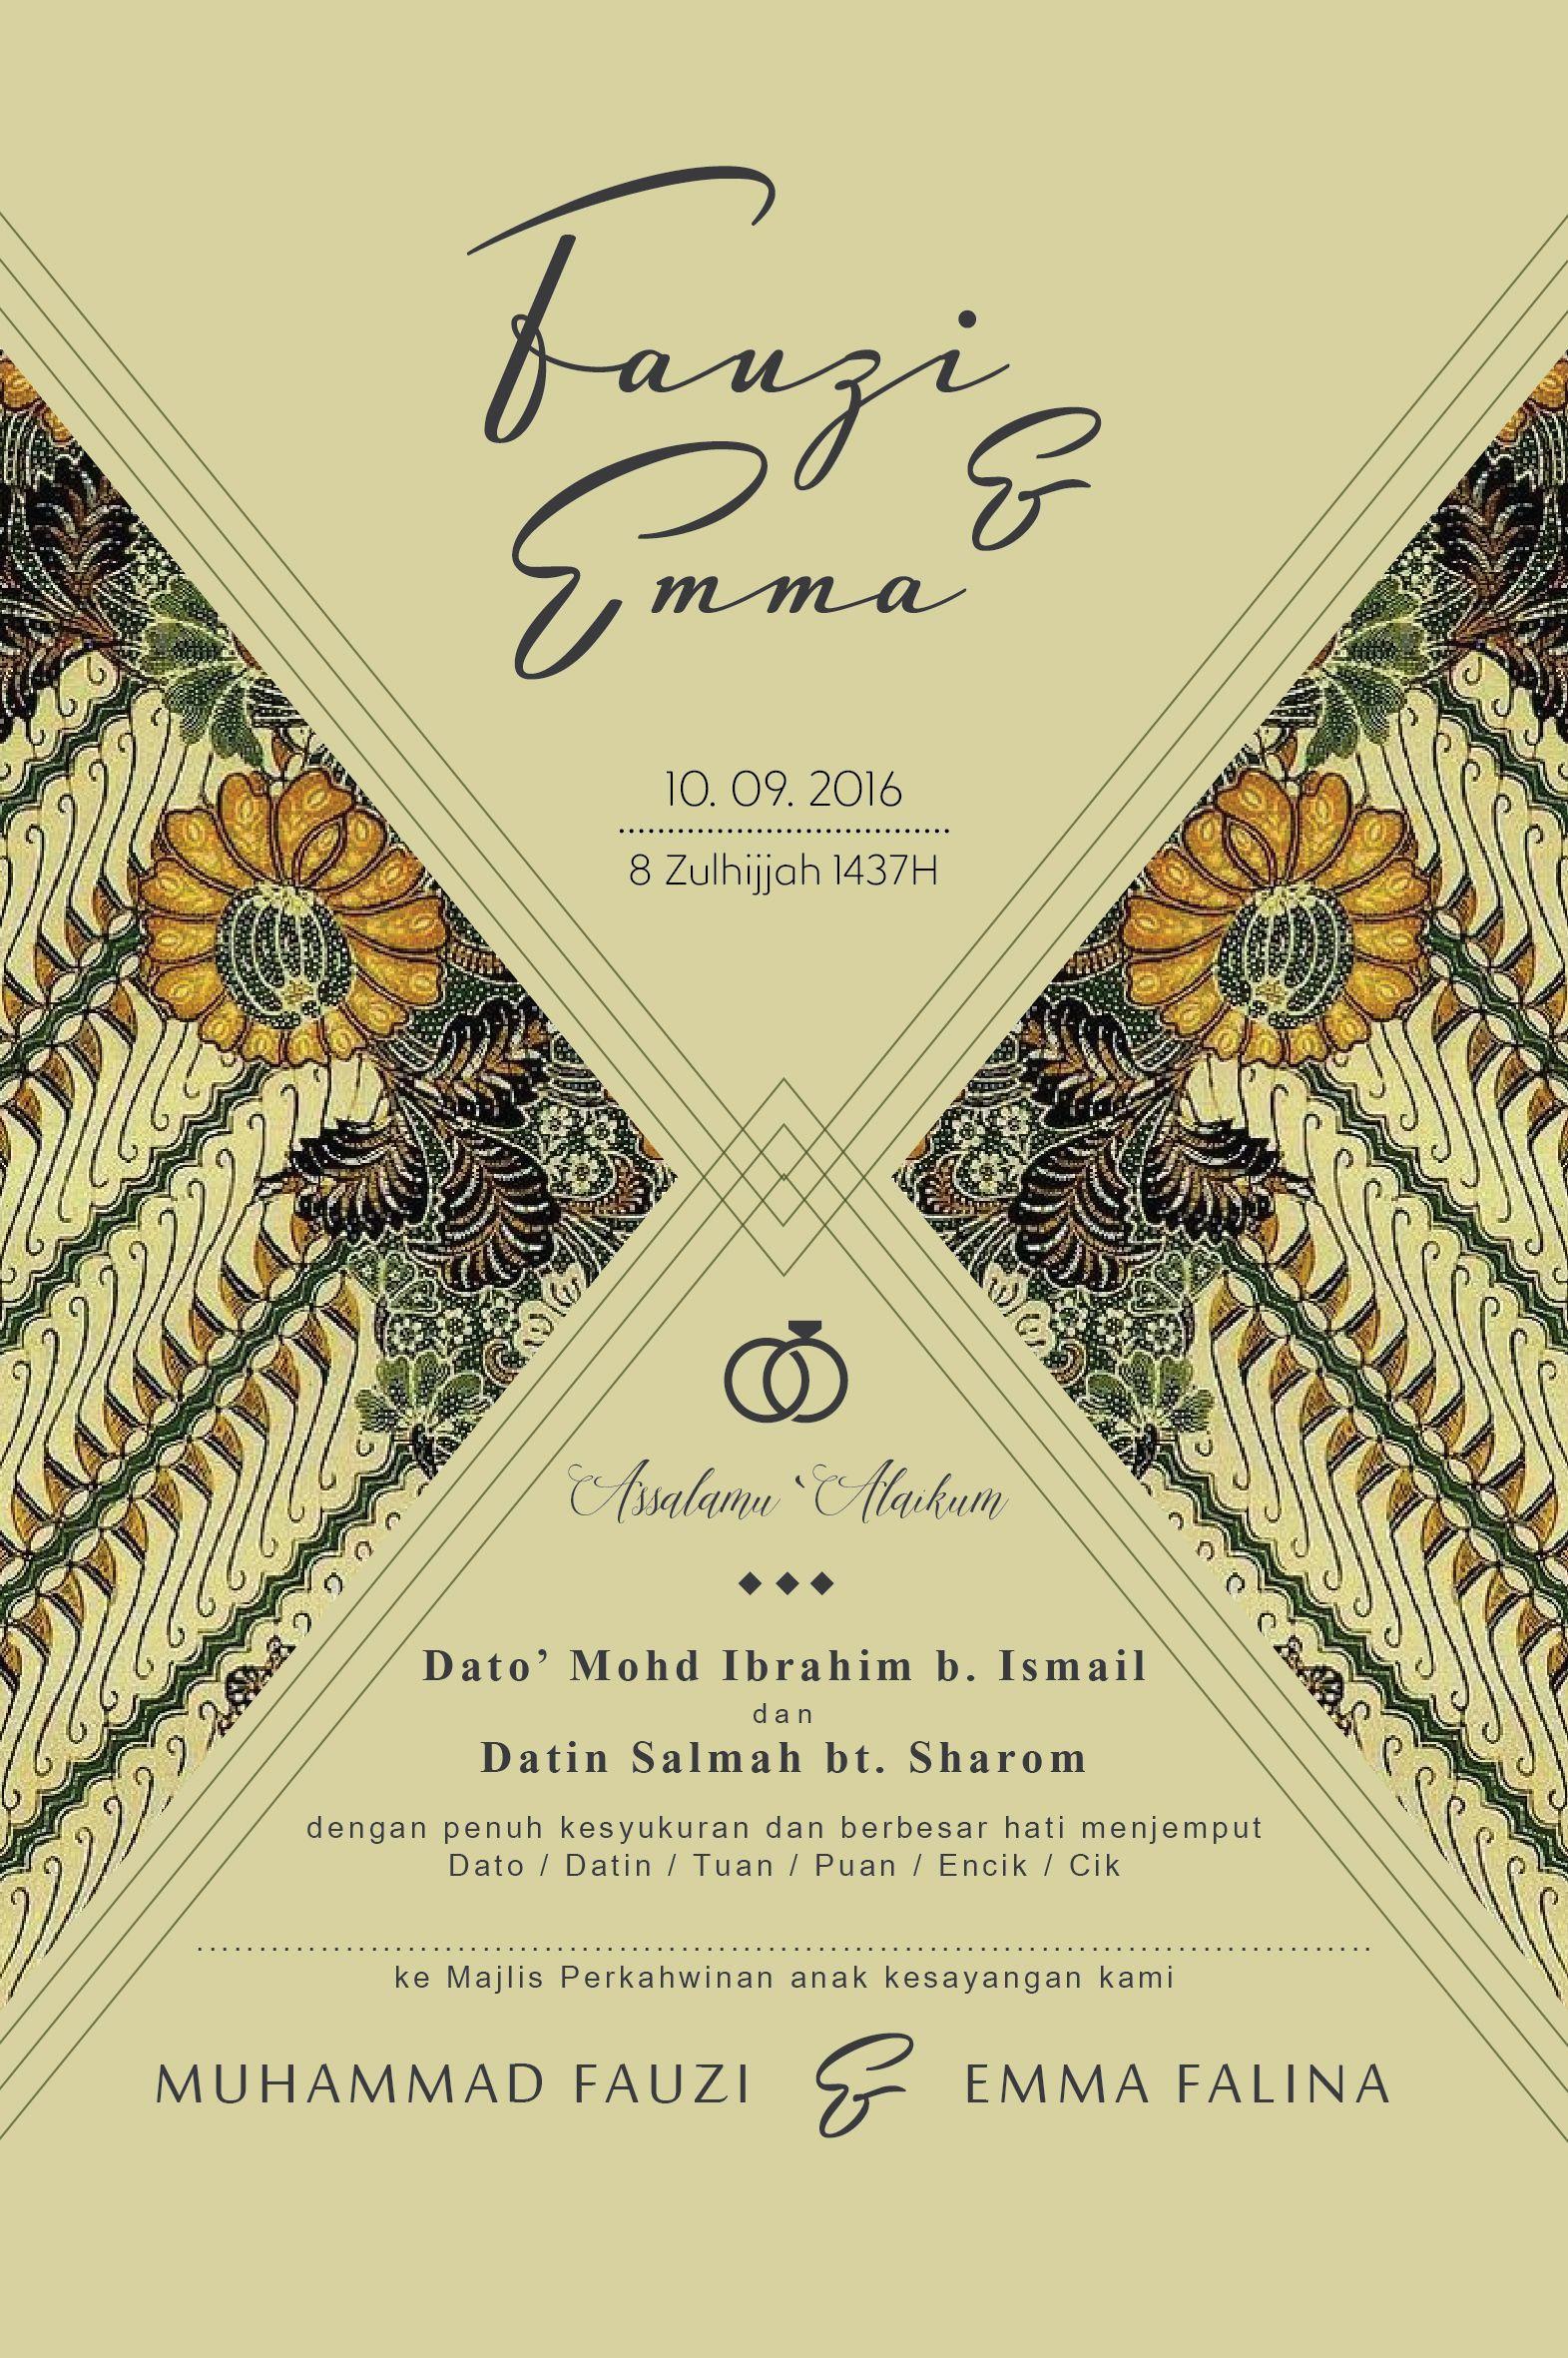 Melayu Klasik Invitation Card Wedding Cards Classic Invitation Classic Wedding Invitations